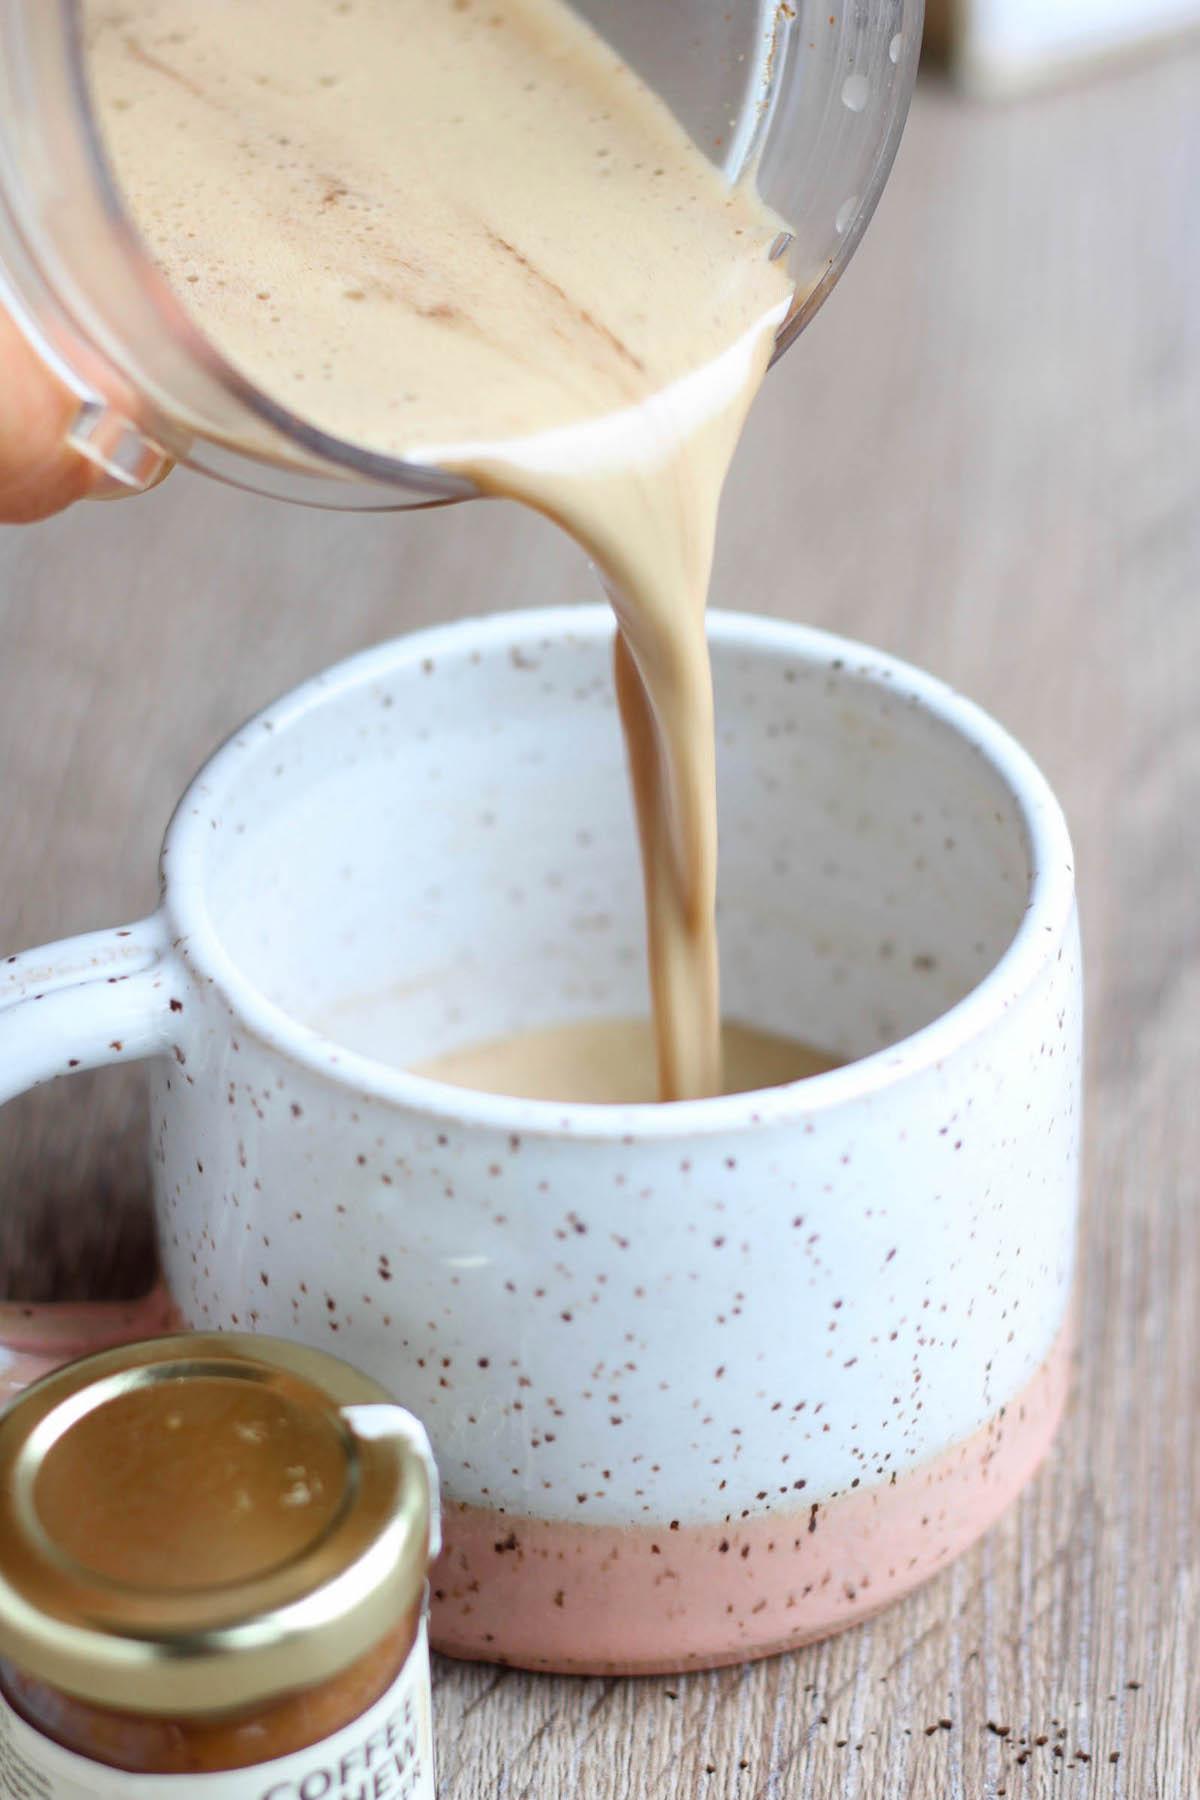 pouring vegan bulletproof coffee into a mug